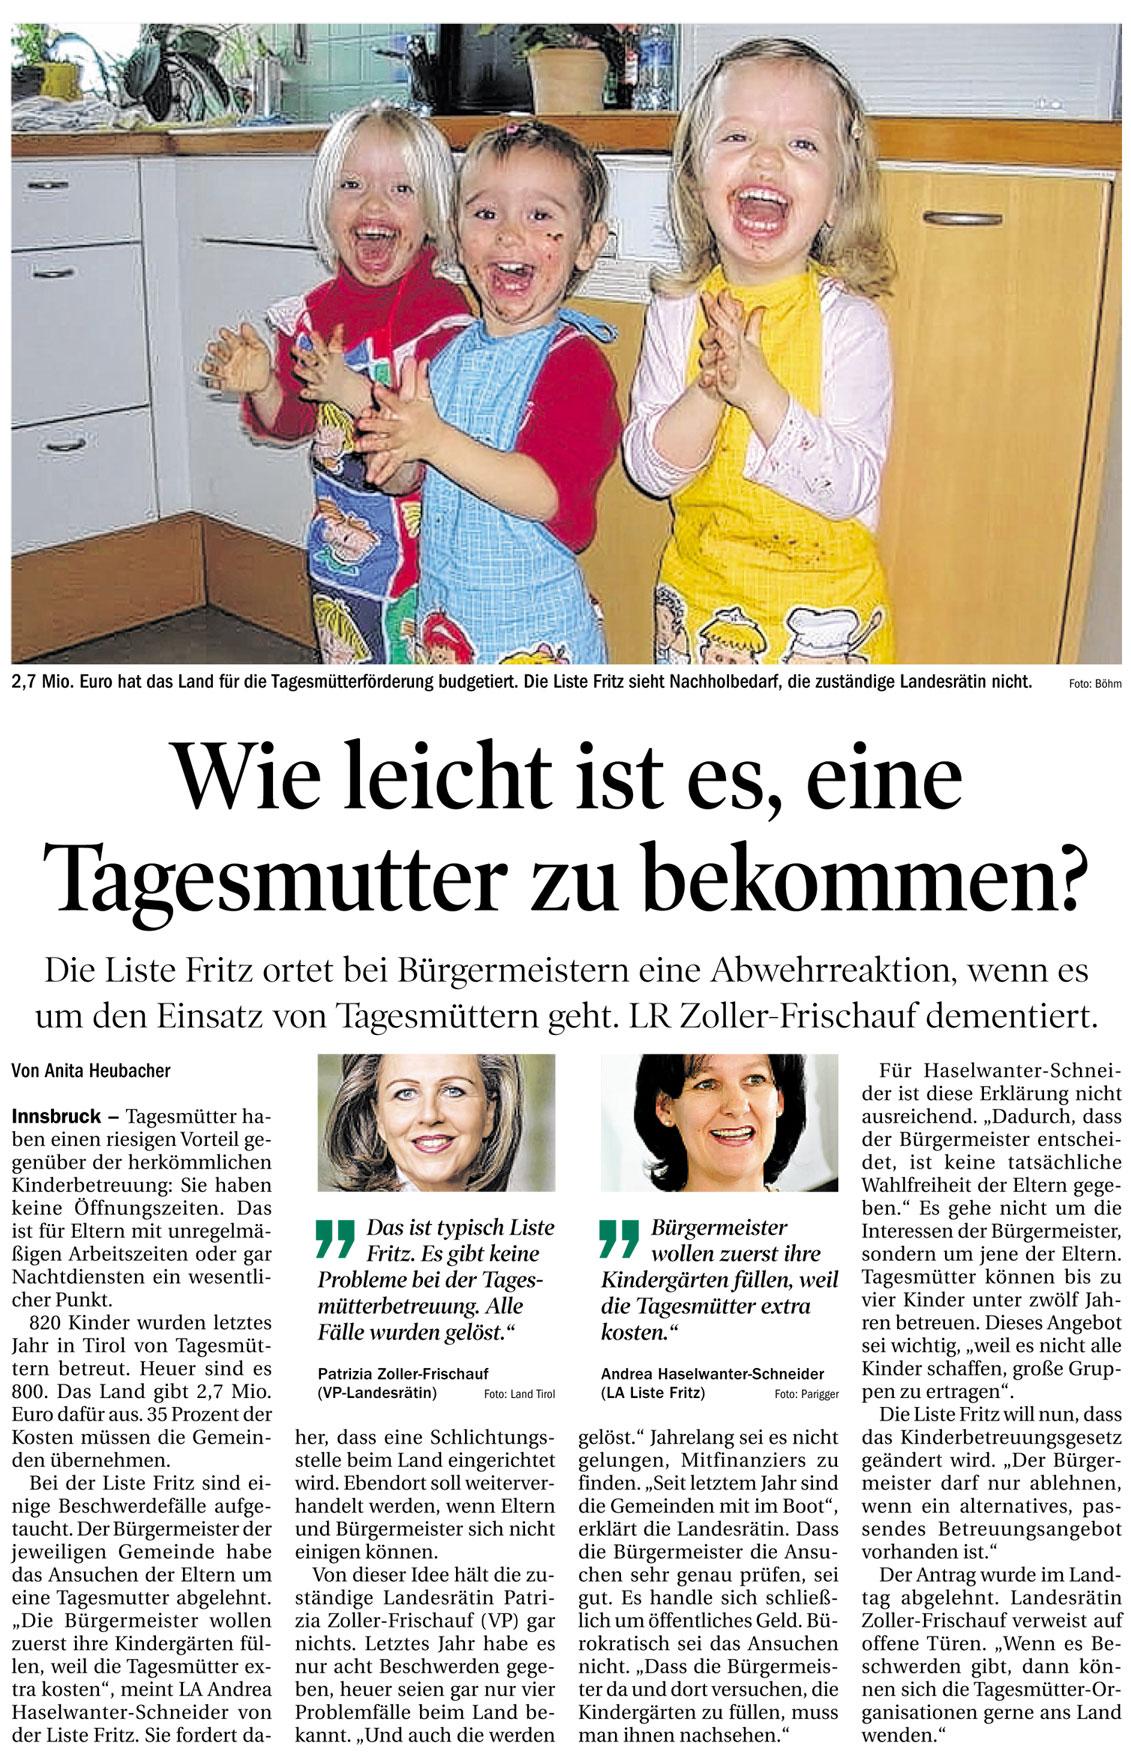 Bericht der Tiroler Tageszeitung zum Thema Tagesmütter in Tirol